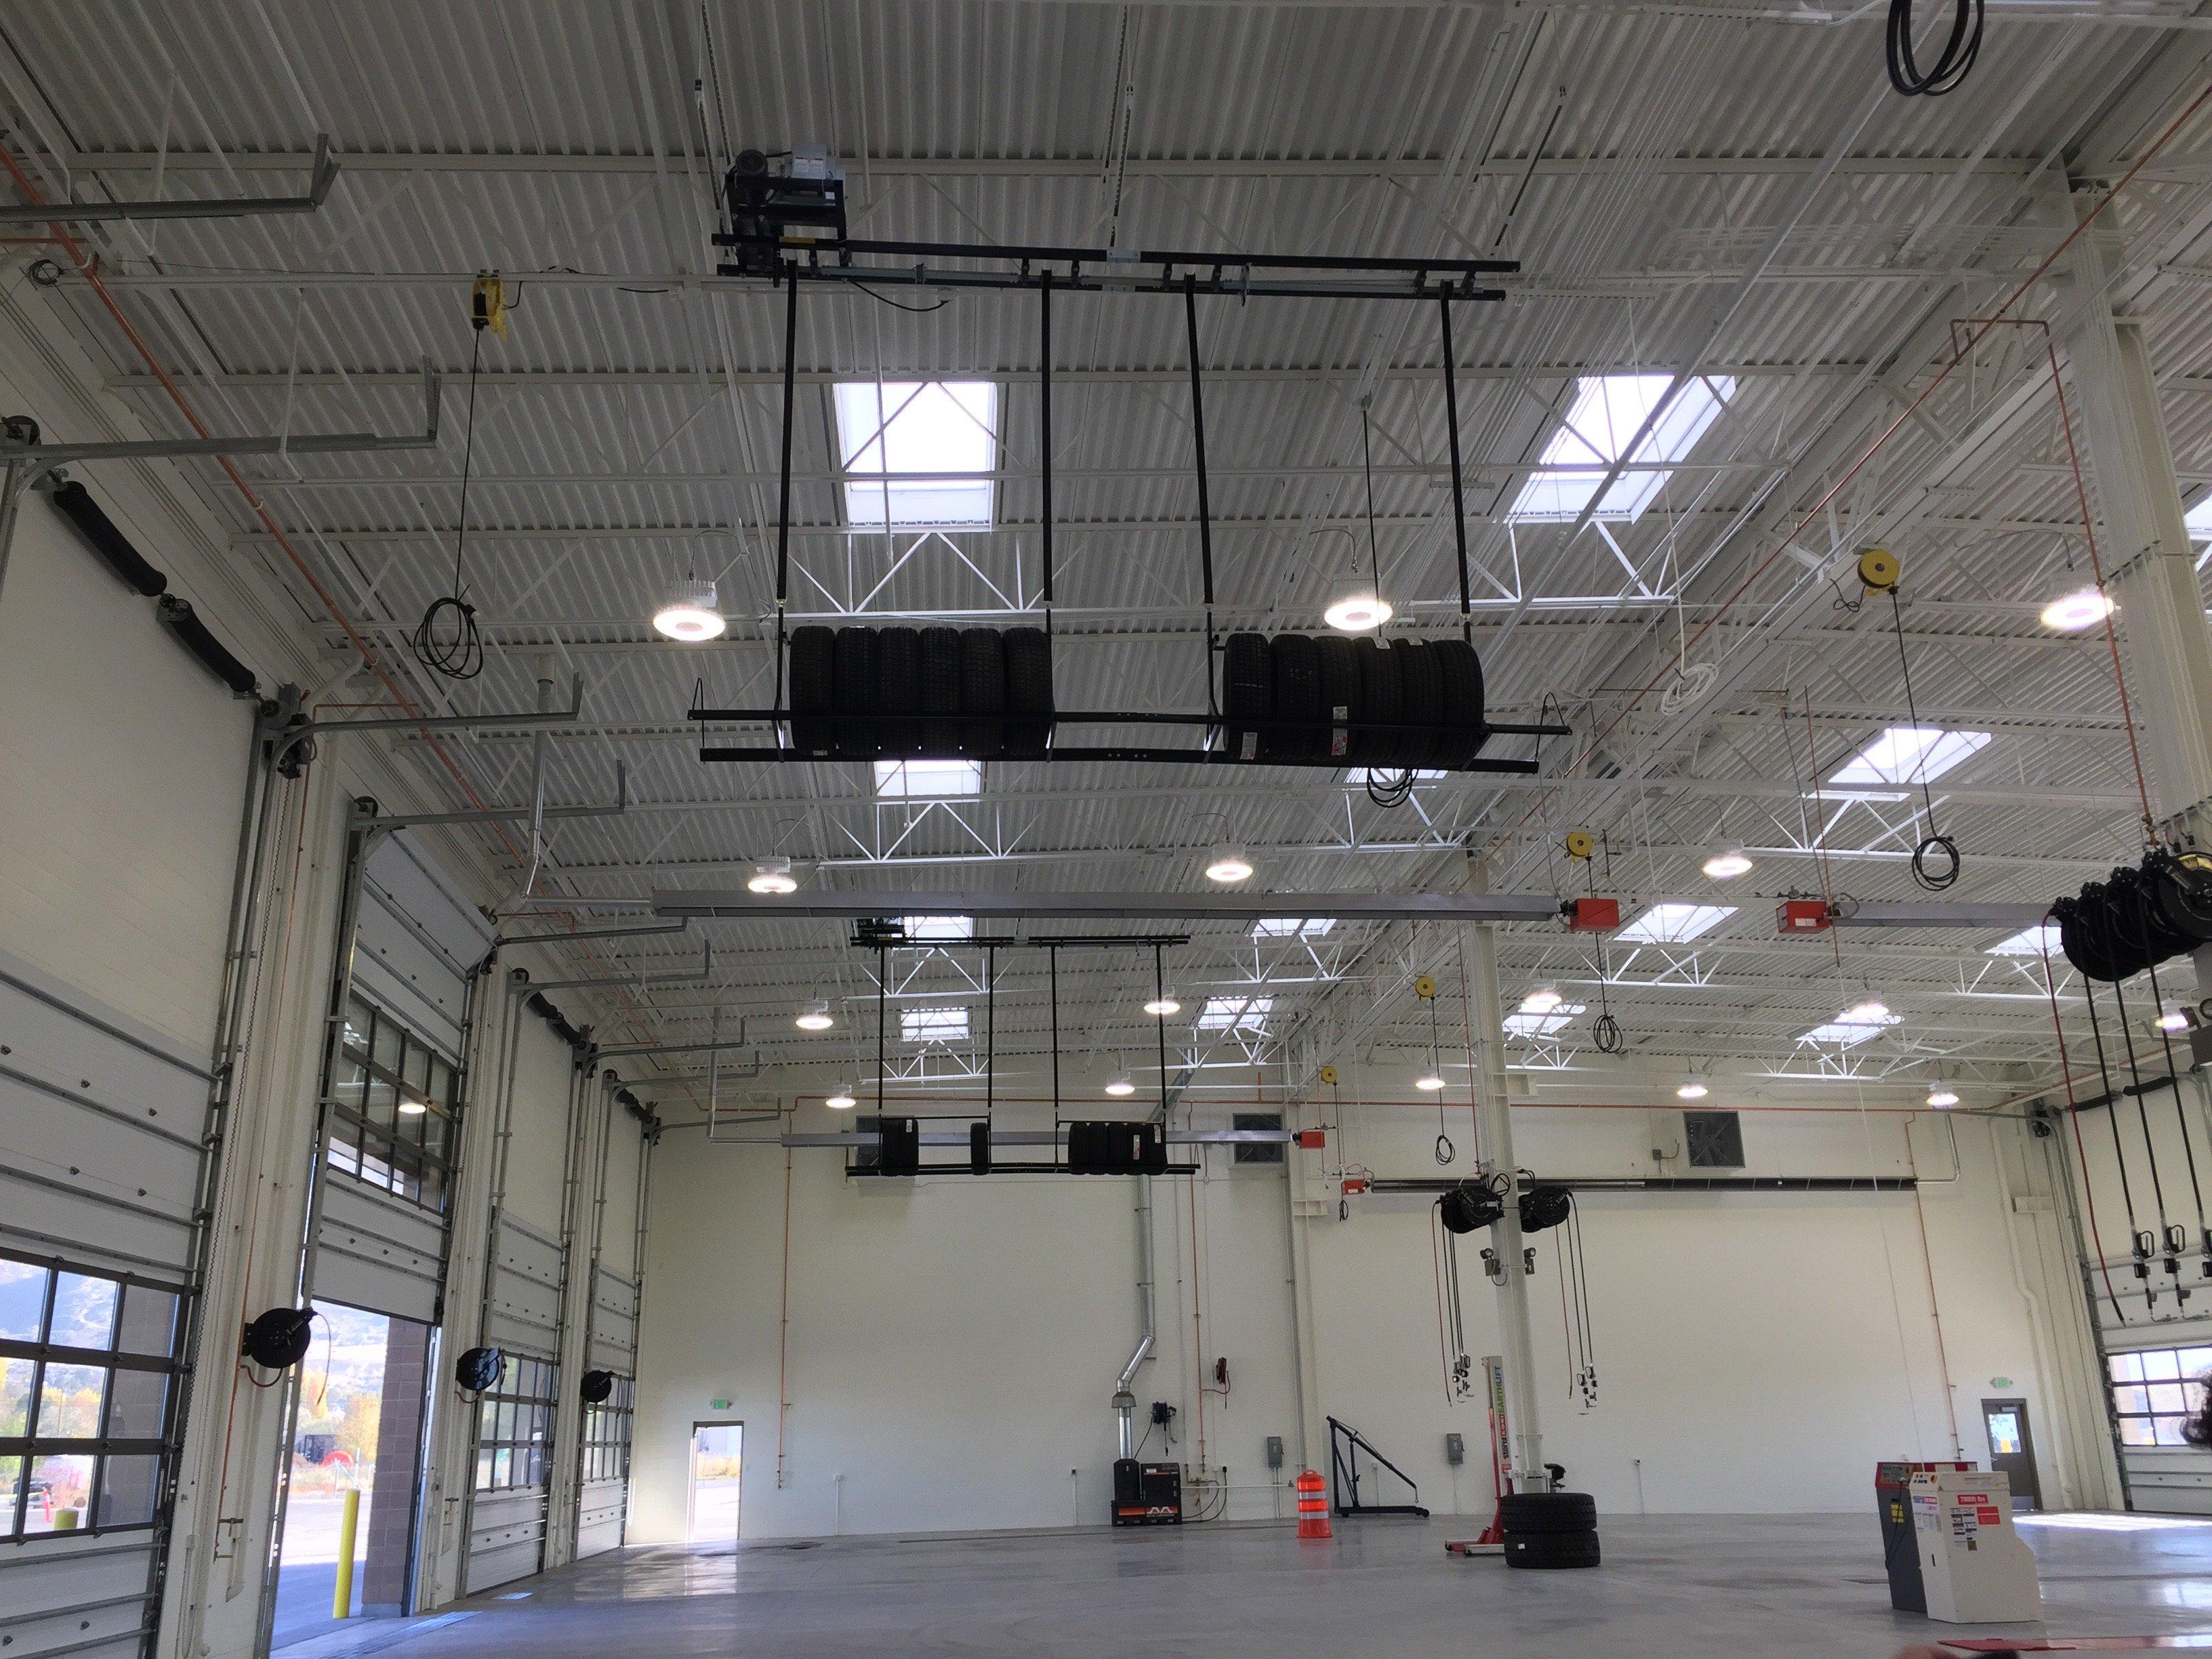 Overhead Tire Storage-service bays